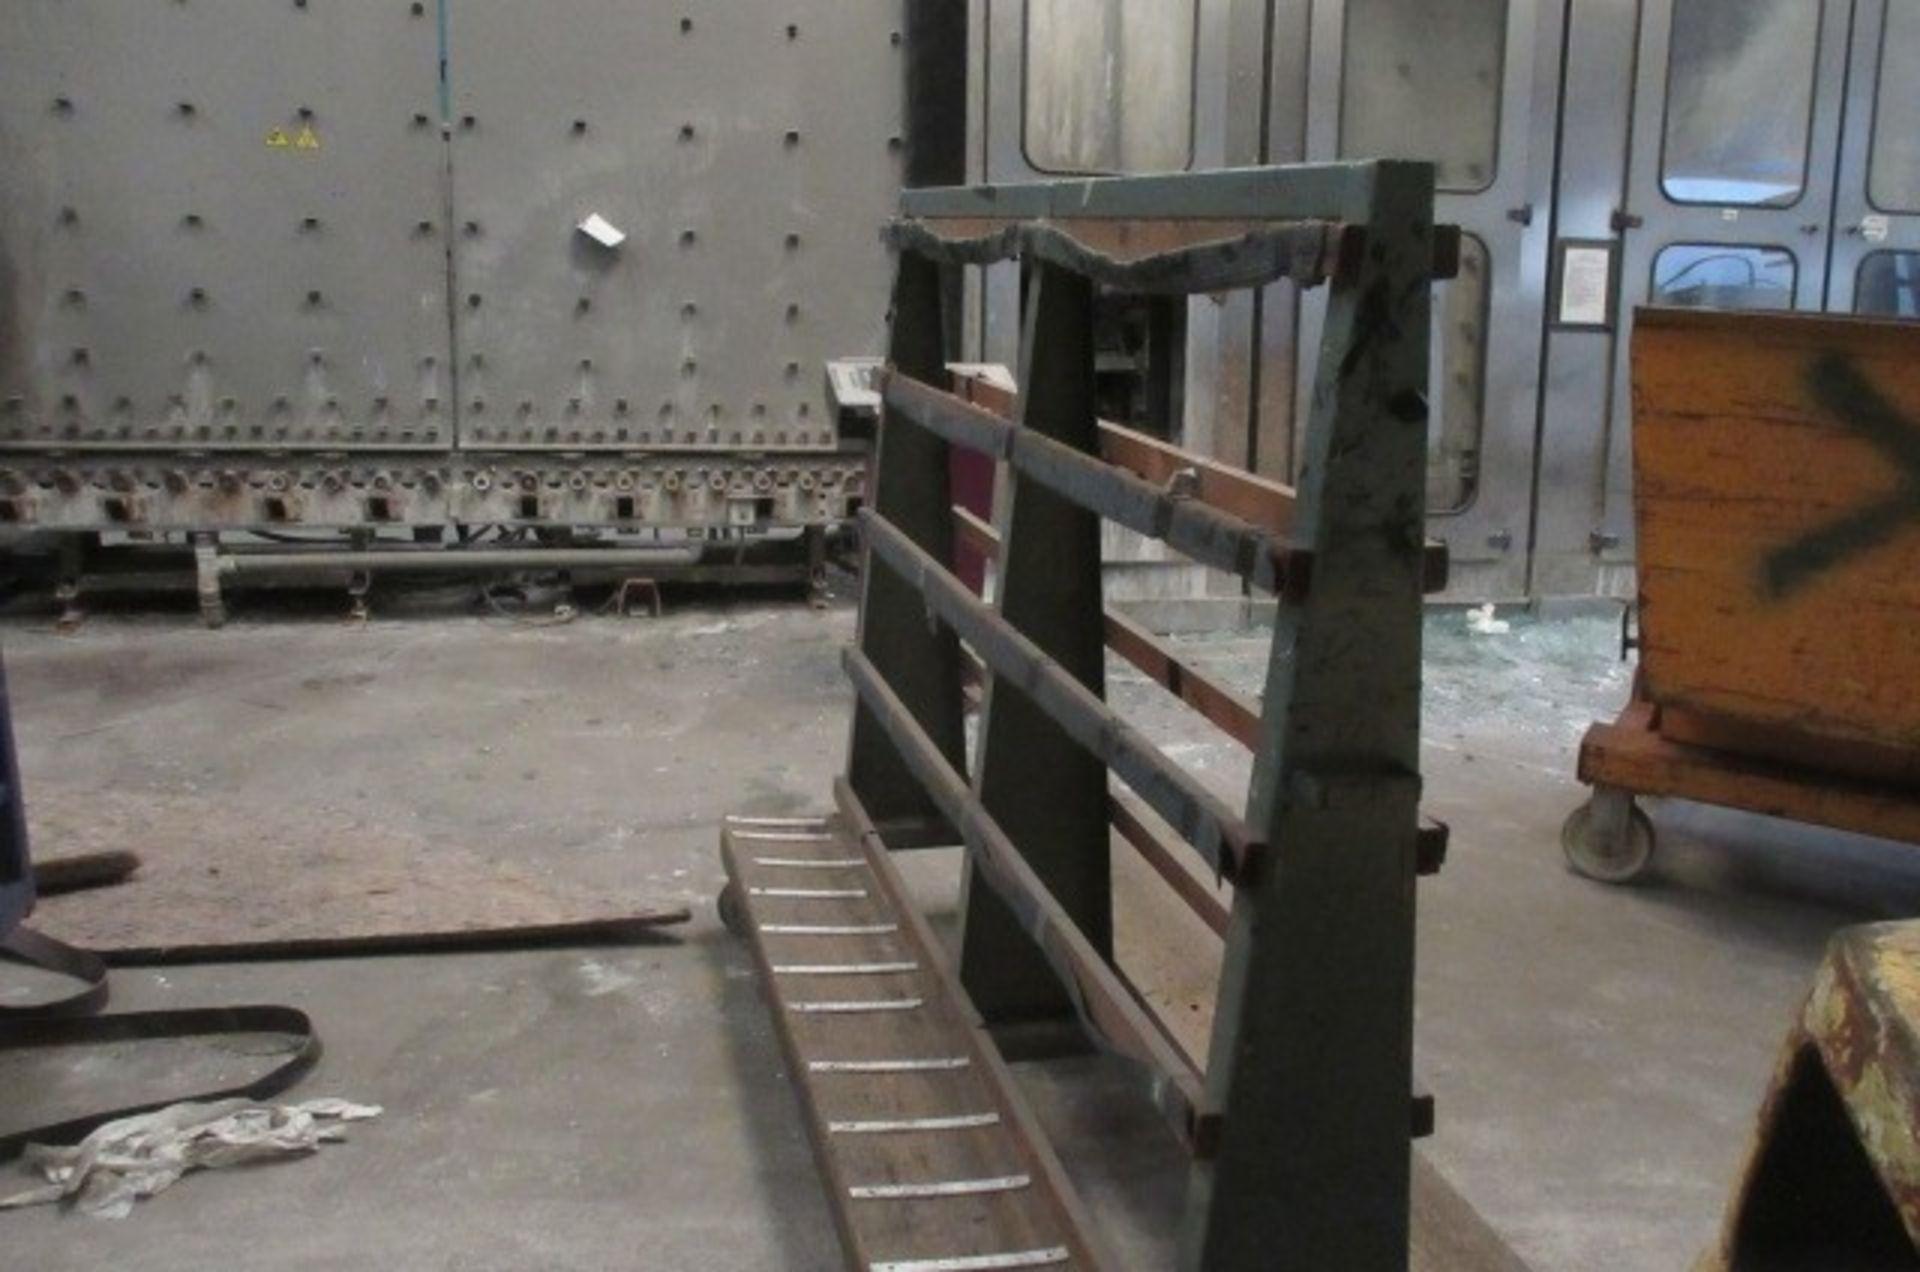 Five 'A' Framed double sided glass transportation racks. Qty 4 size 2m x 1m x 1.6m high & Qty 1 size